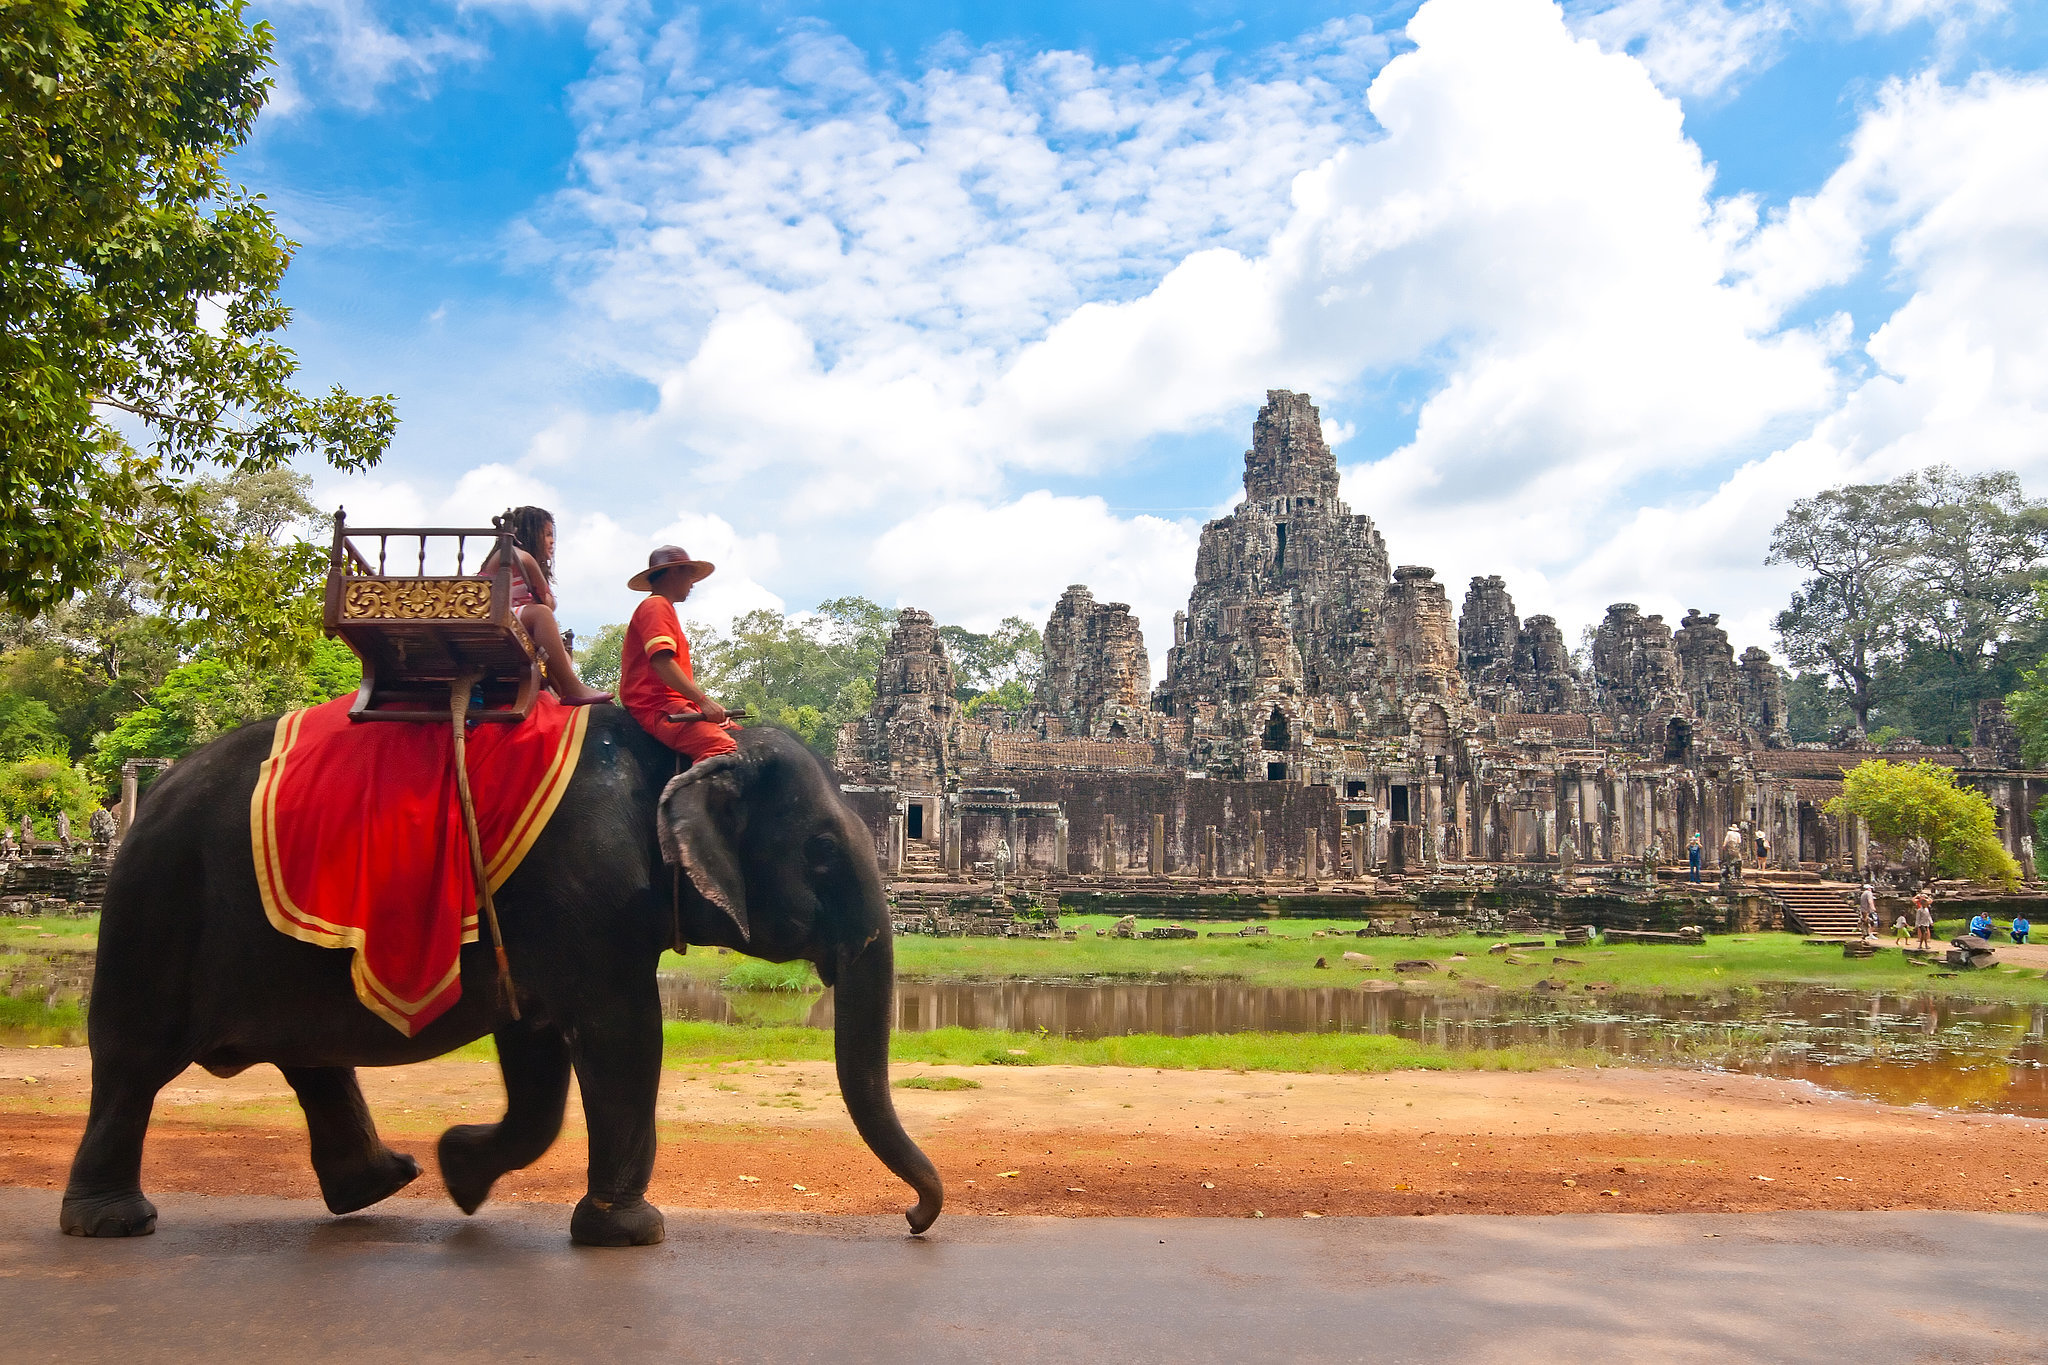 vacanze in cambogia e vietnam 1